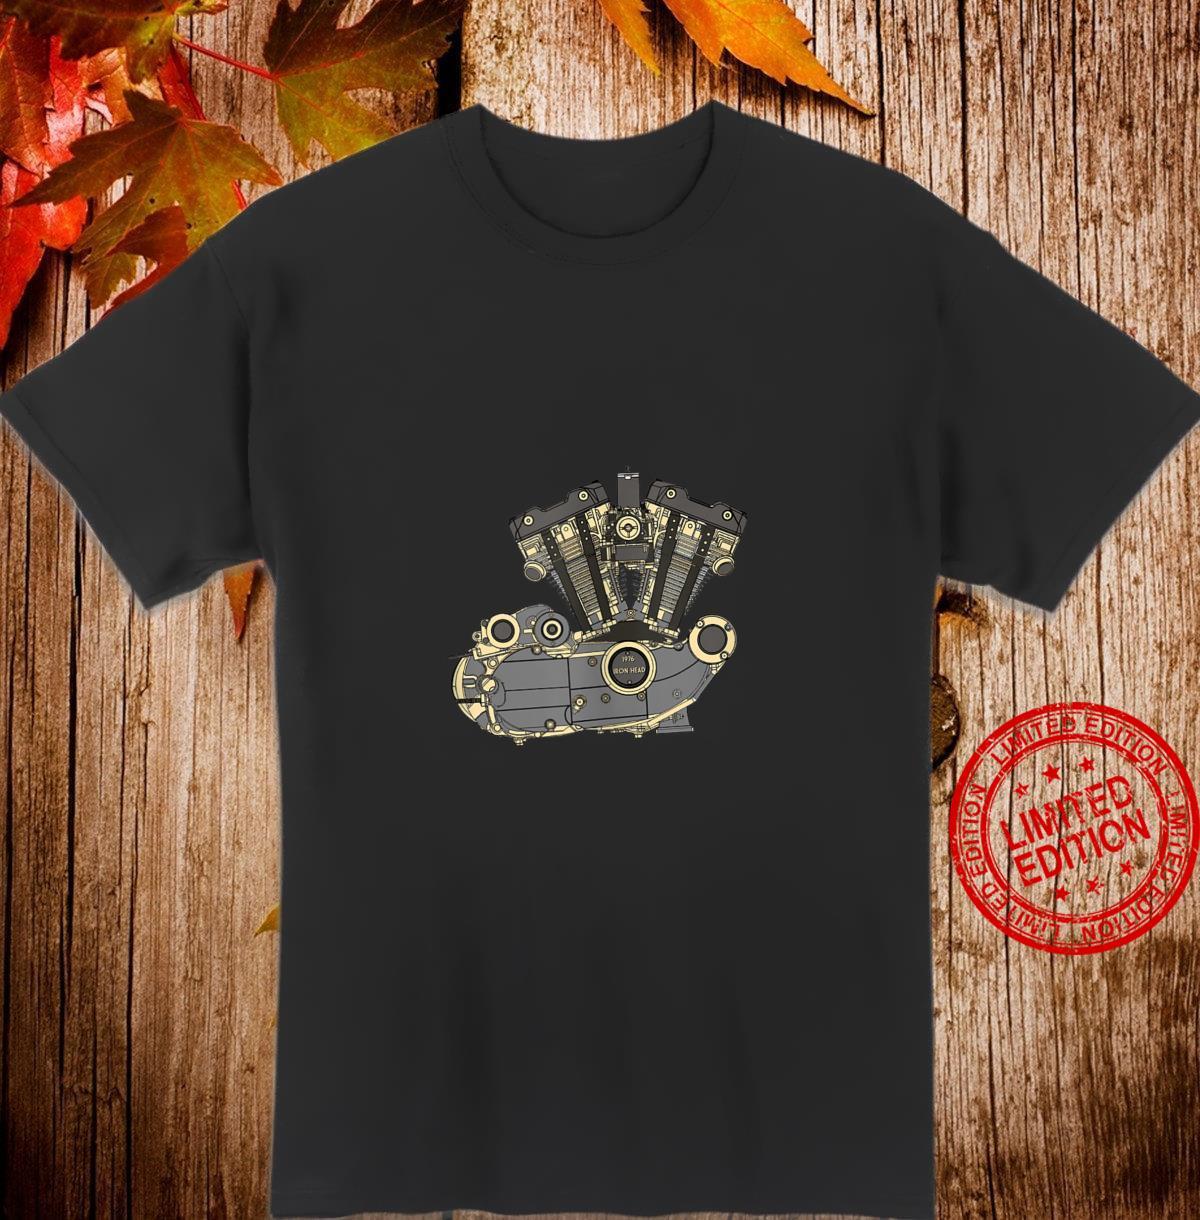 Legendary American 1976 Iron Head Motorcycle Engine Shirt